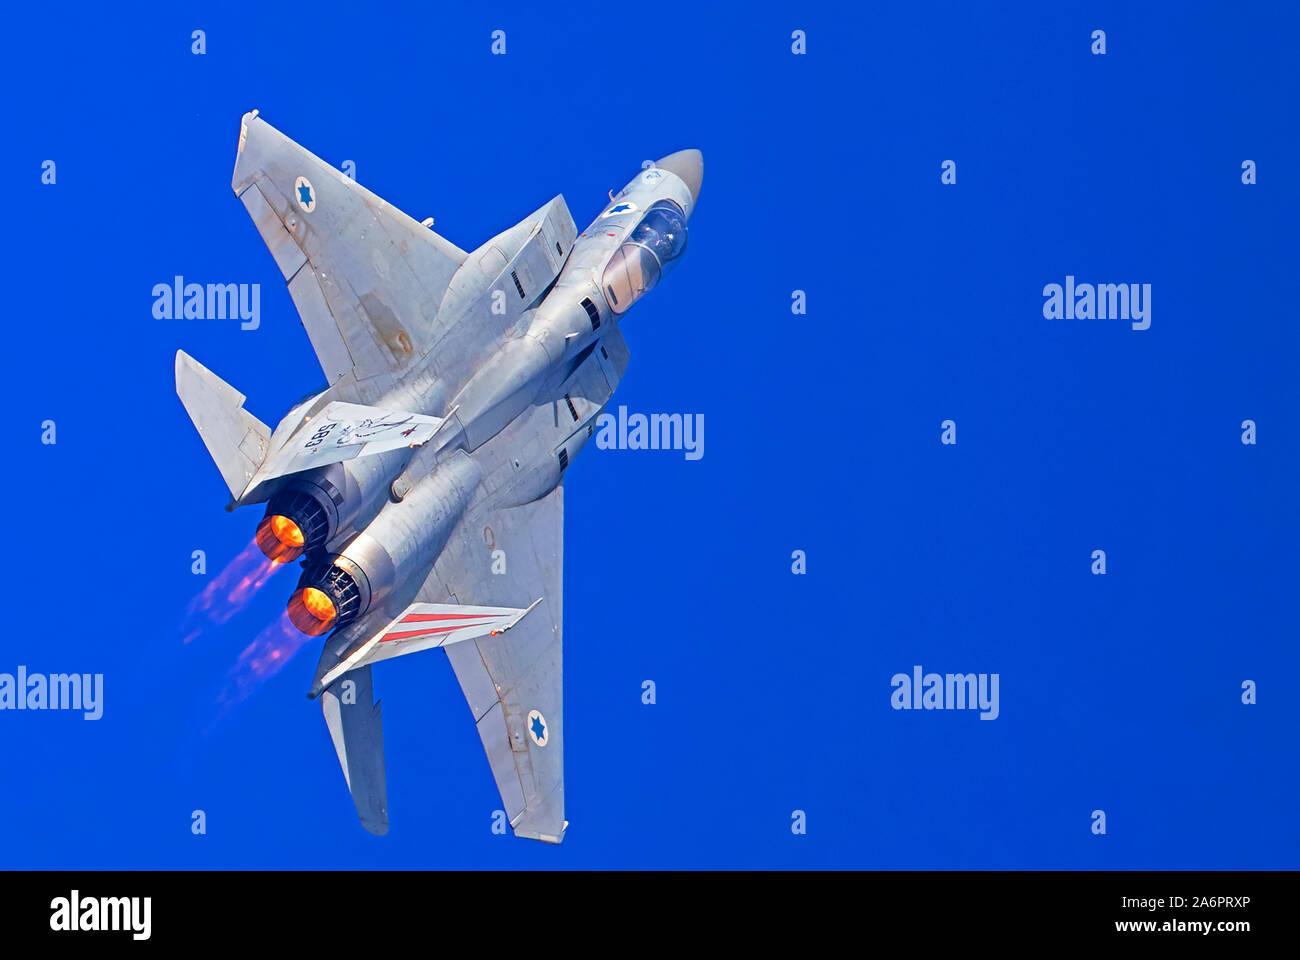 Israeli Air force (IAF) F-15C (Baz) Fighter jet in flight Stock Photo